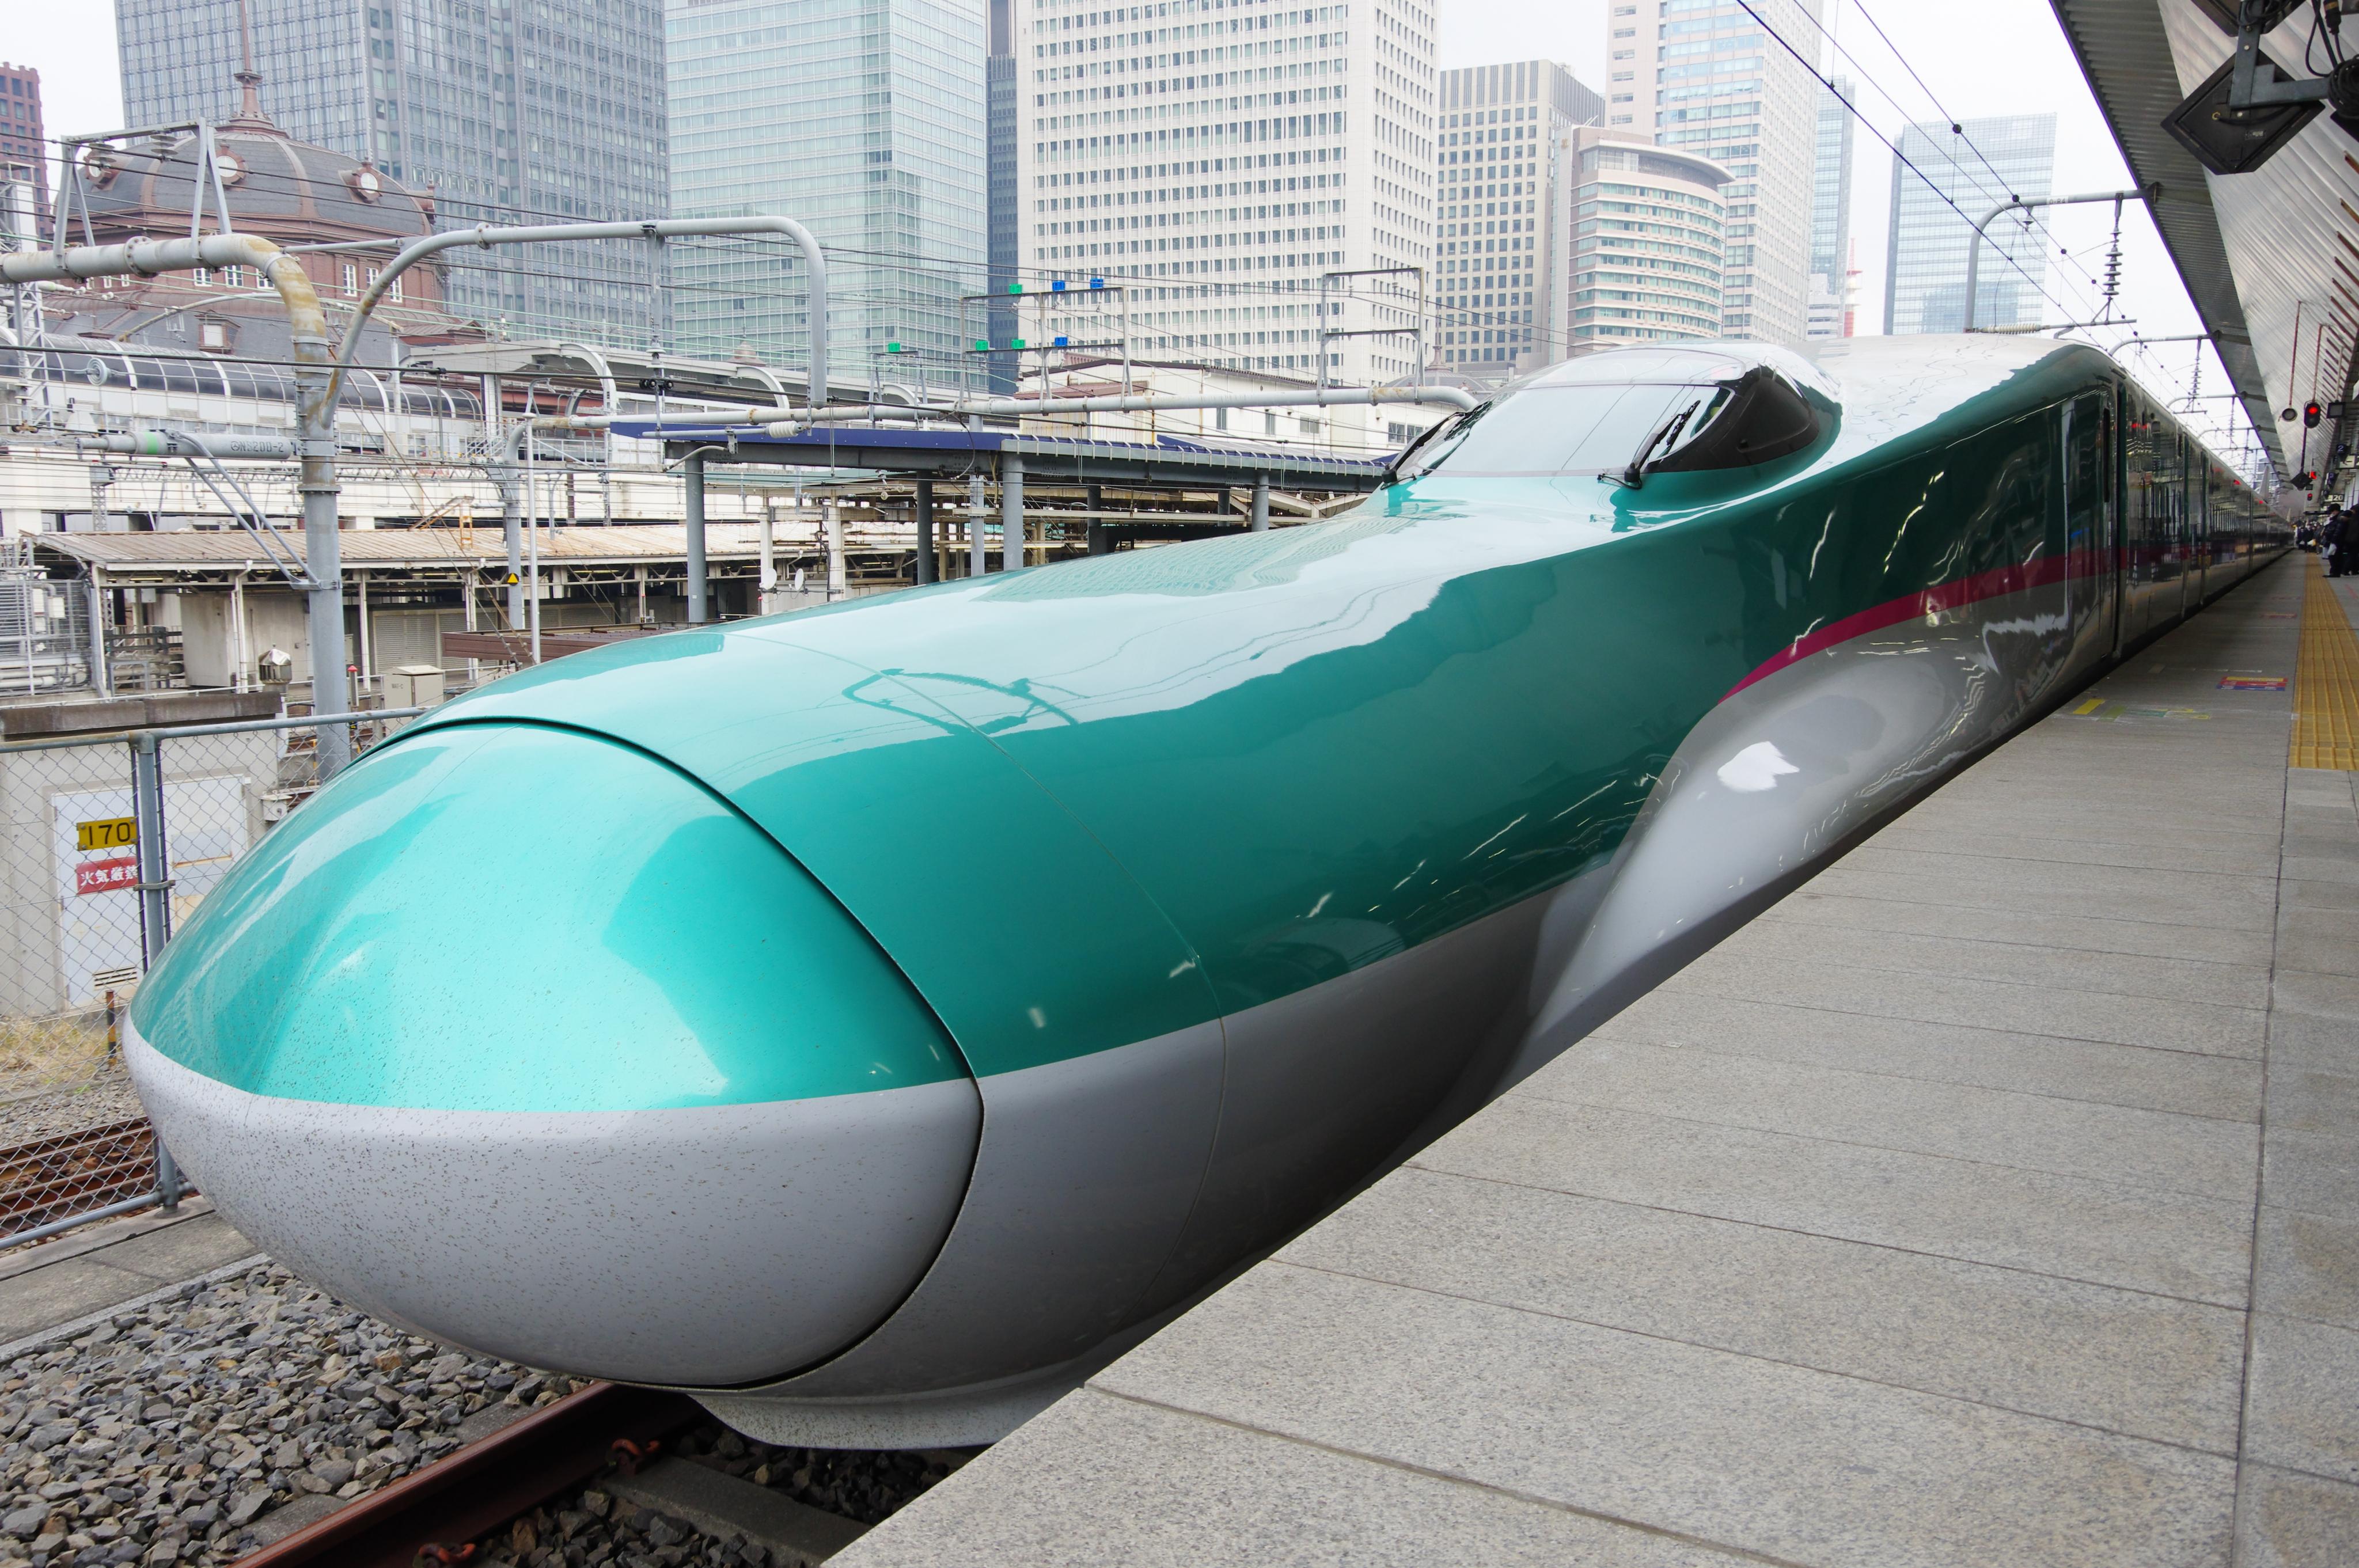 E5系+E6系 はやぶさ+こまち15号 東京駅_190225 (2).jpg